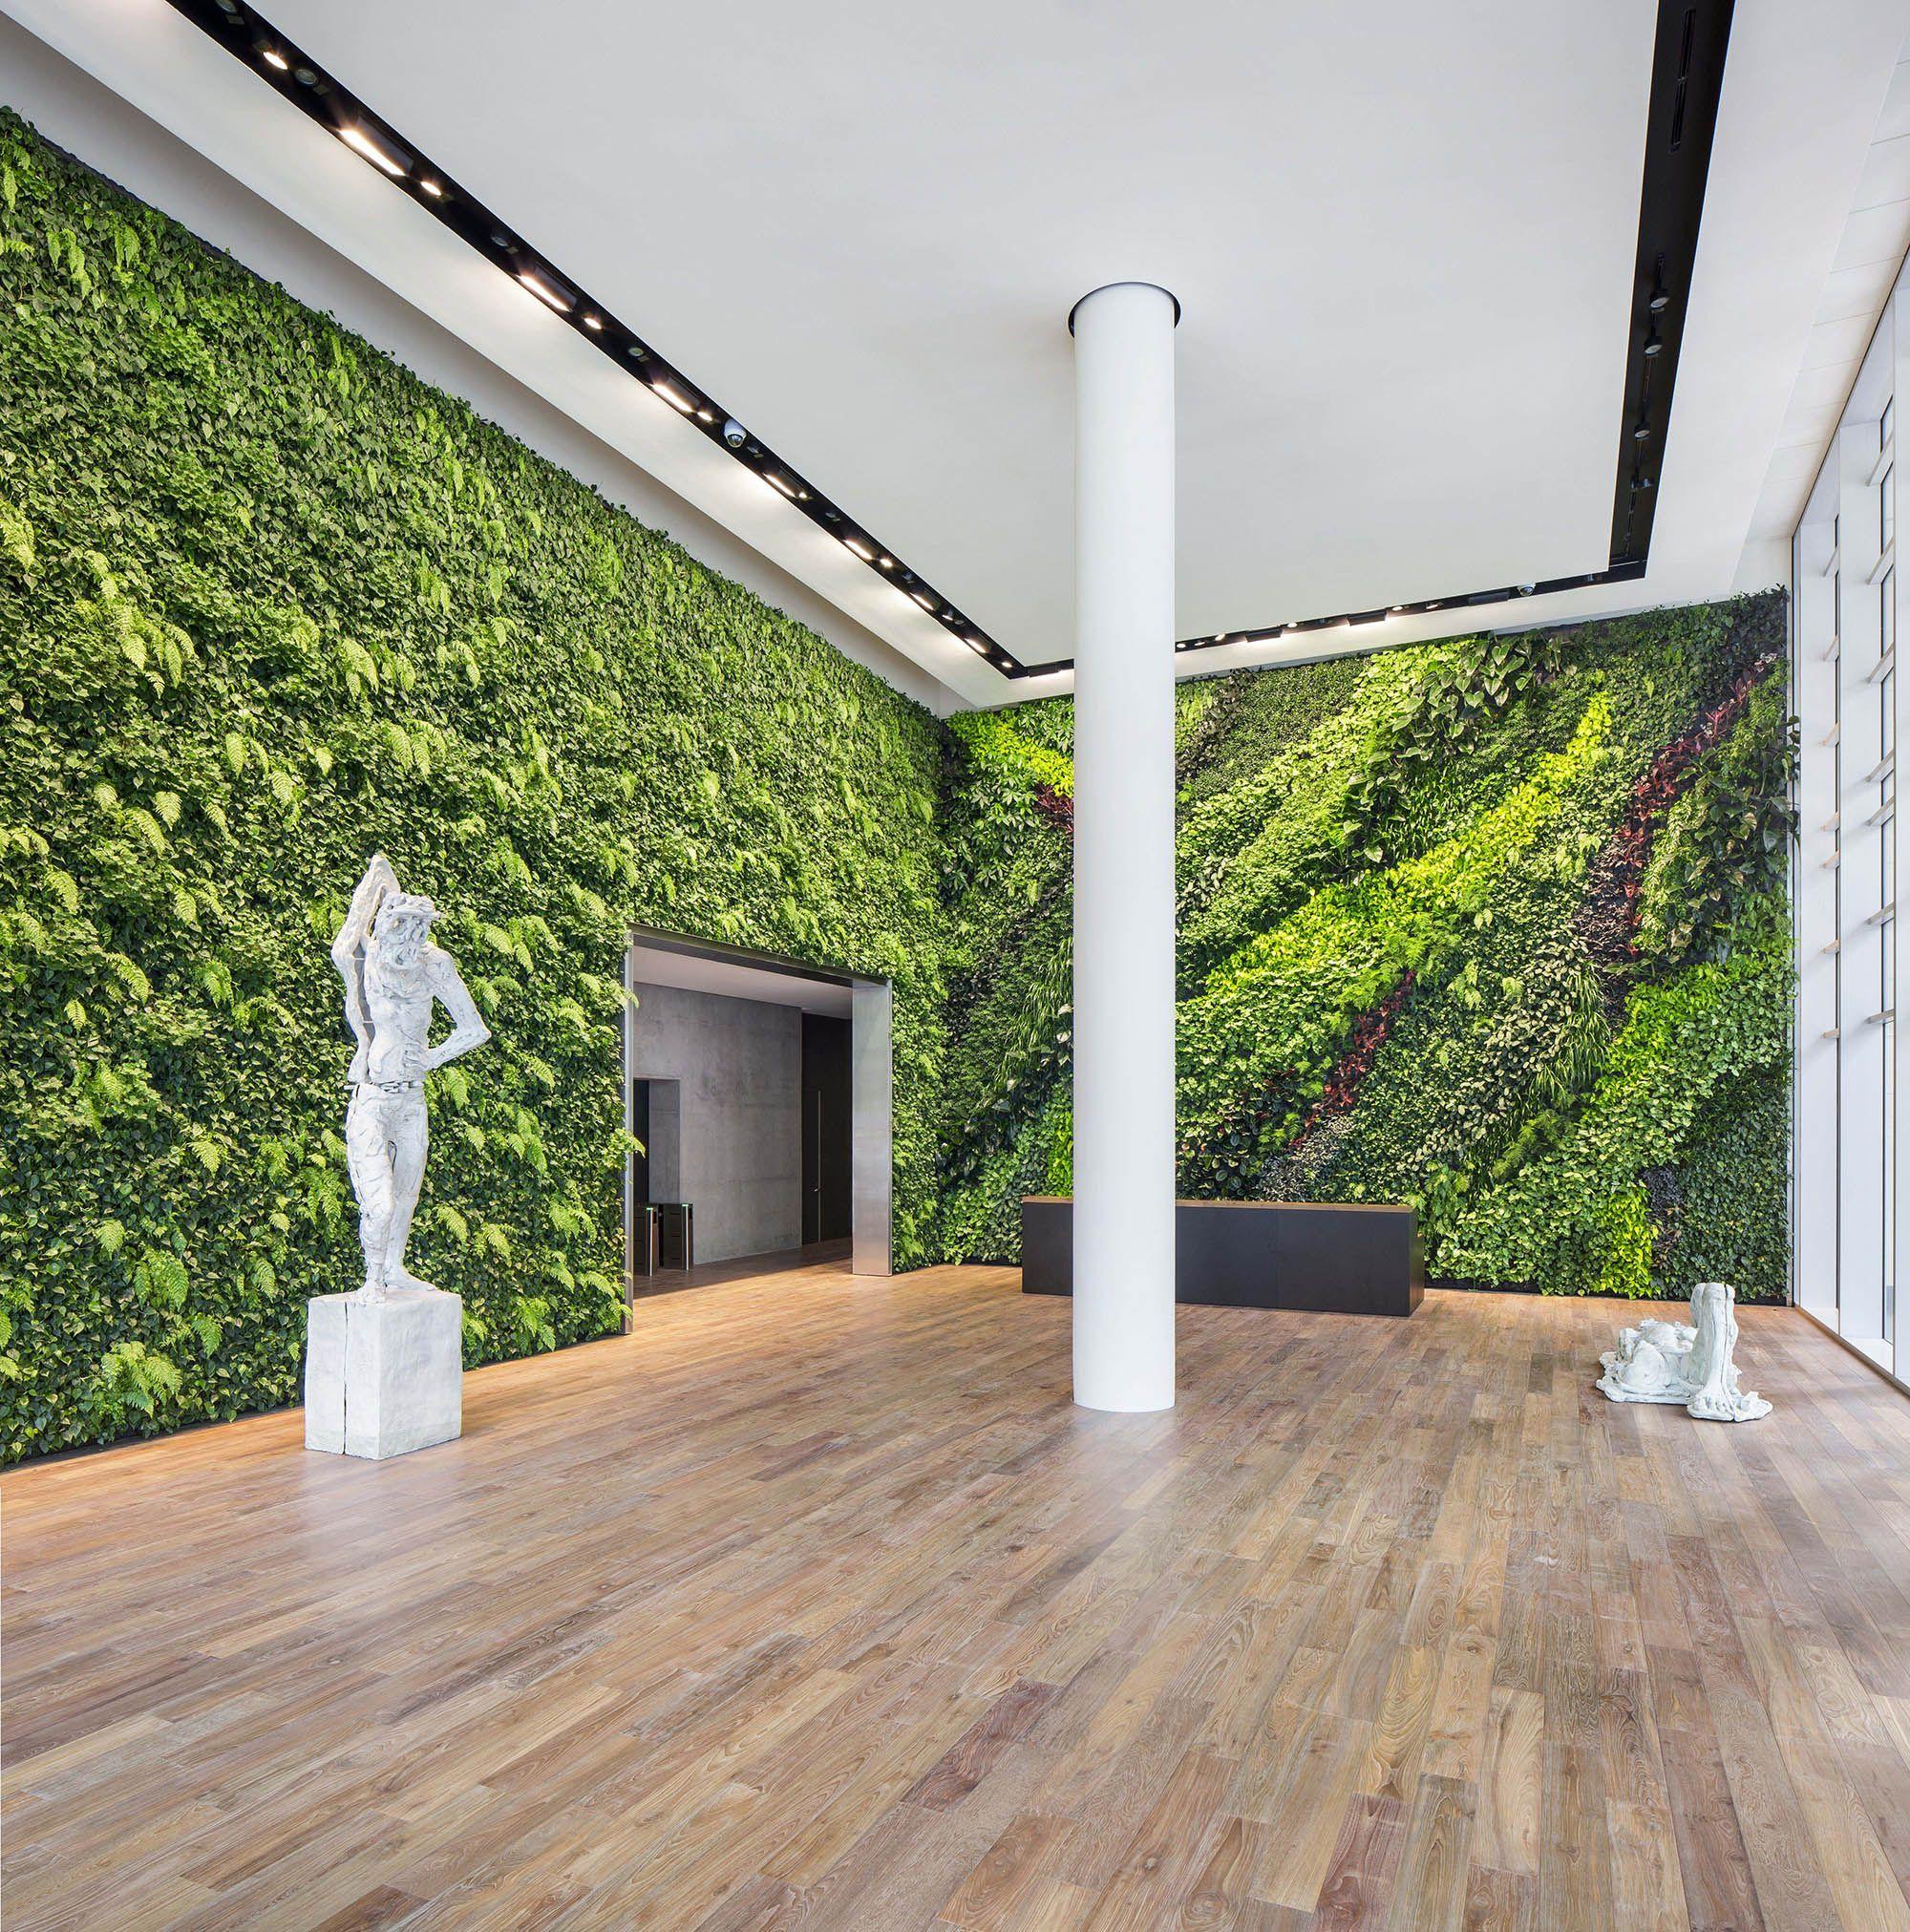 Foundry III Living Wall, 505 Howard St. Green Wall - Habitat ...